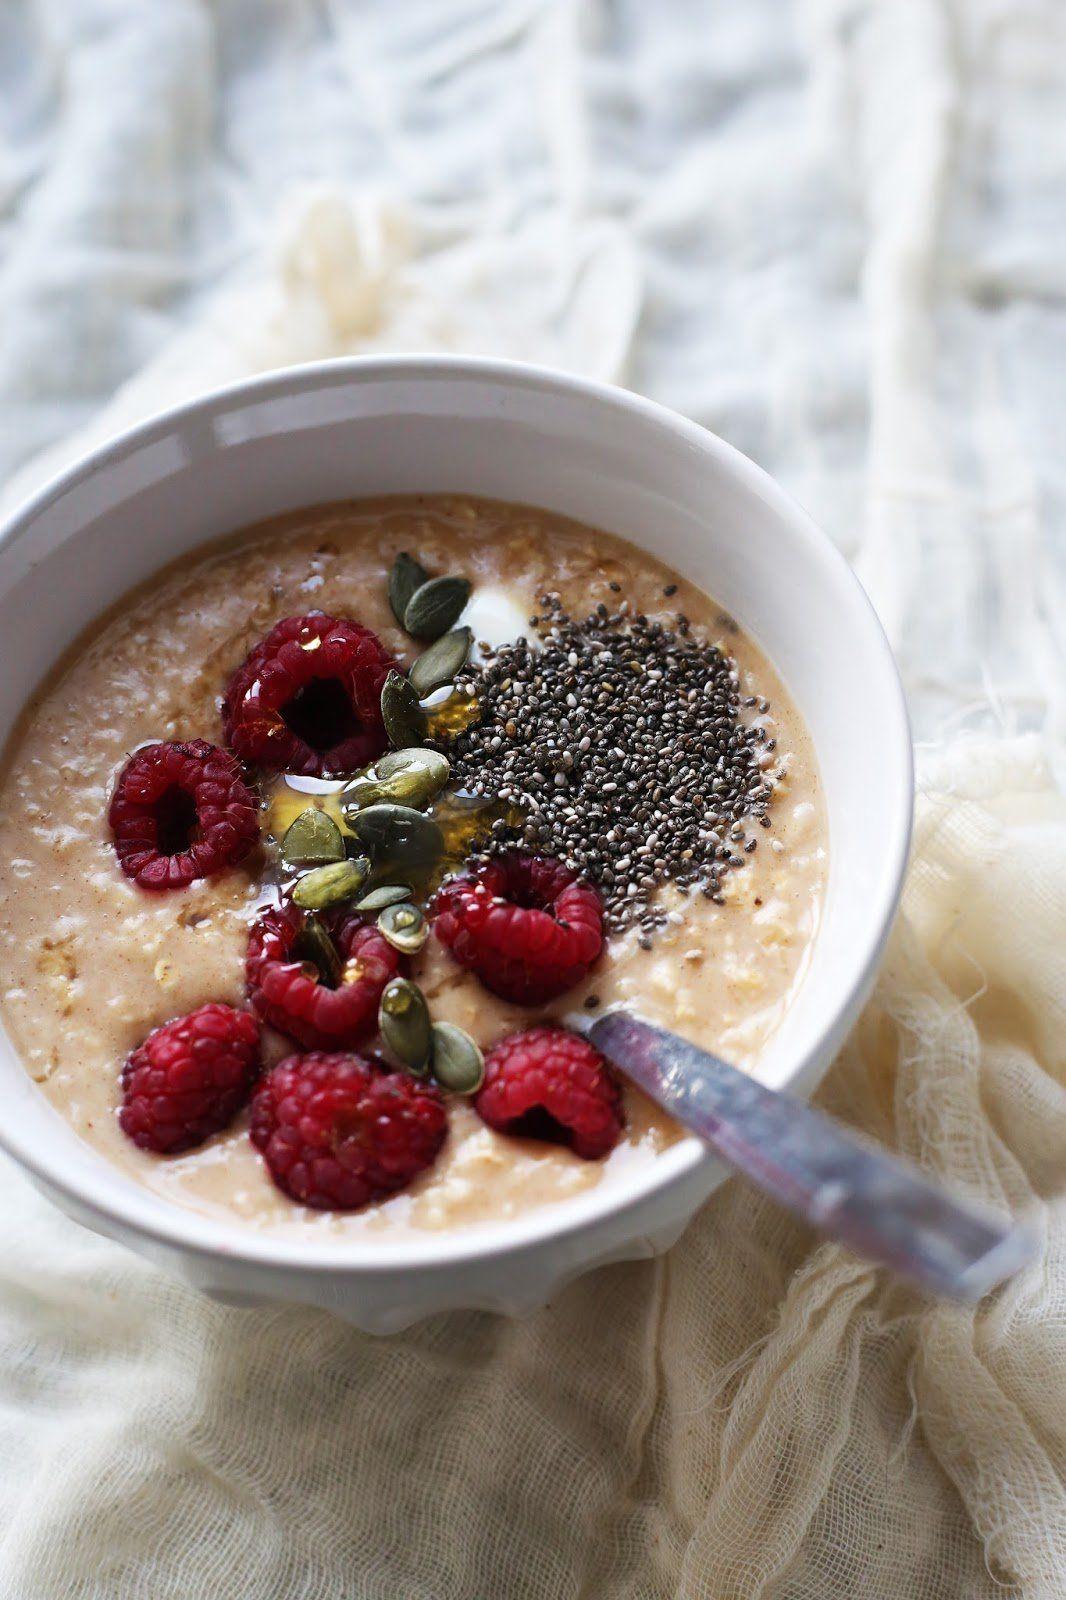 Eat Love - Maca berry super porridge! - http://gostinhos.com/eat-love-maca-berry-super-porridge/